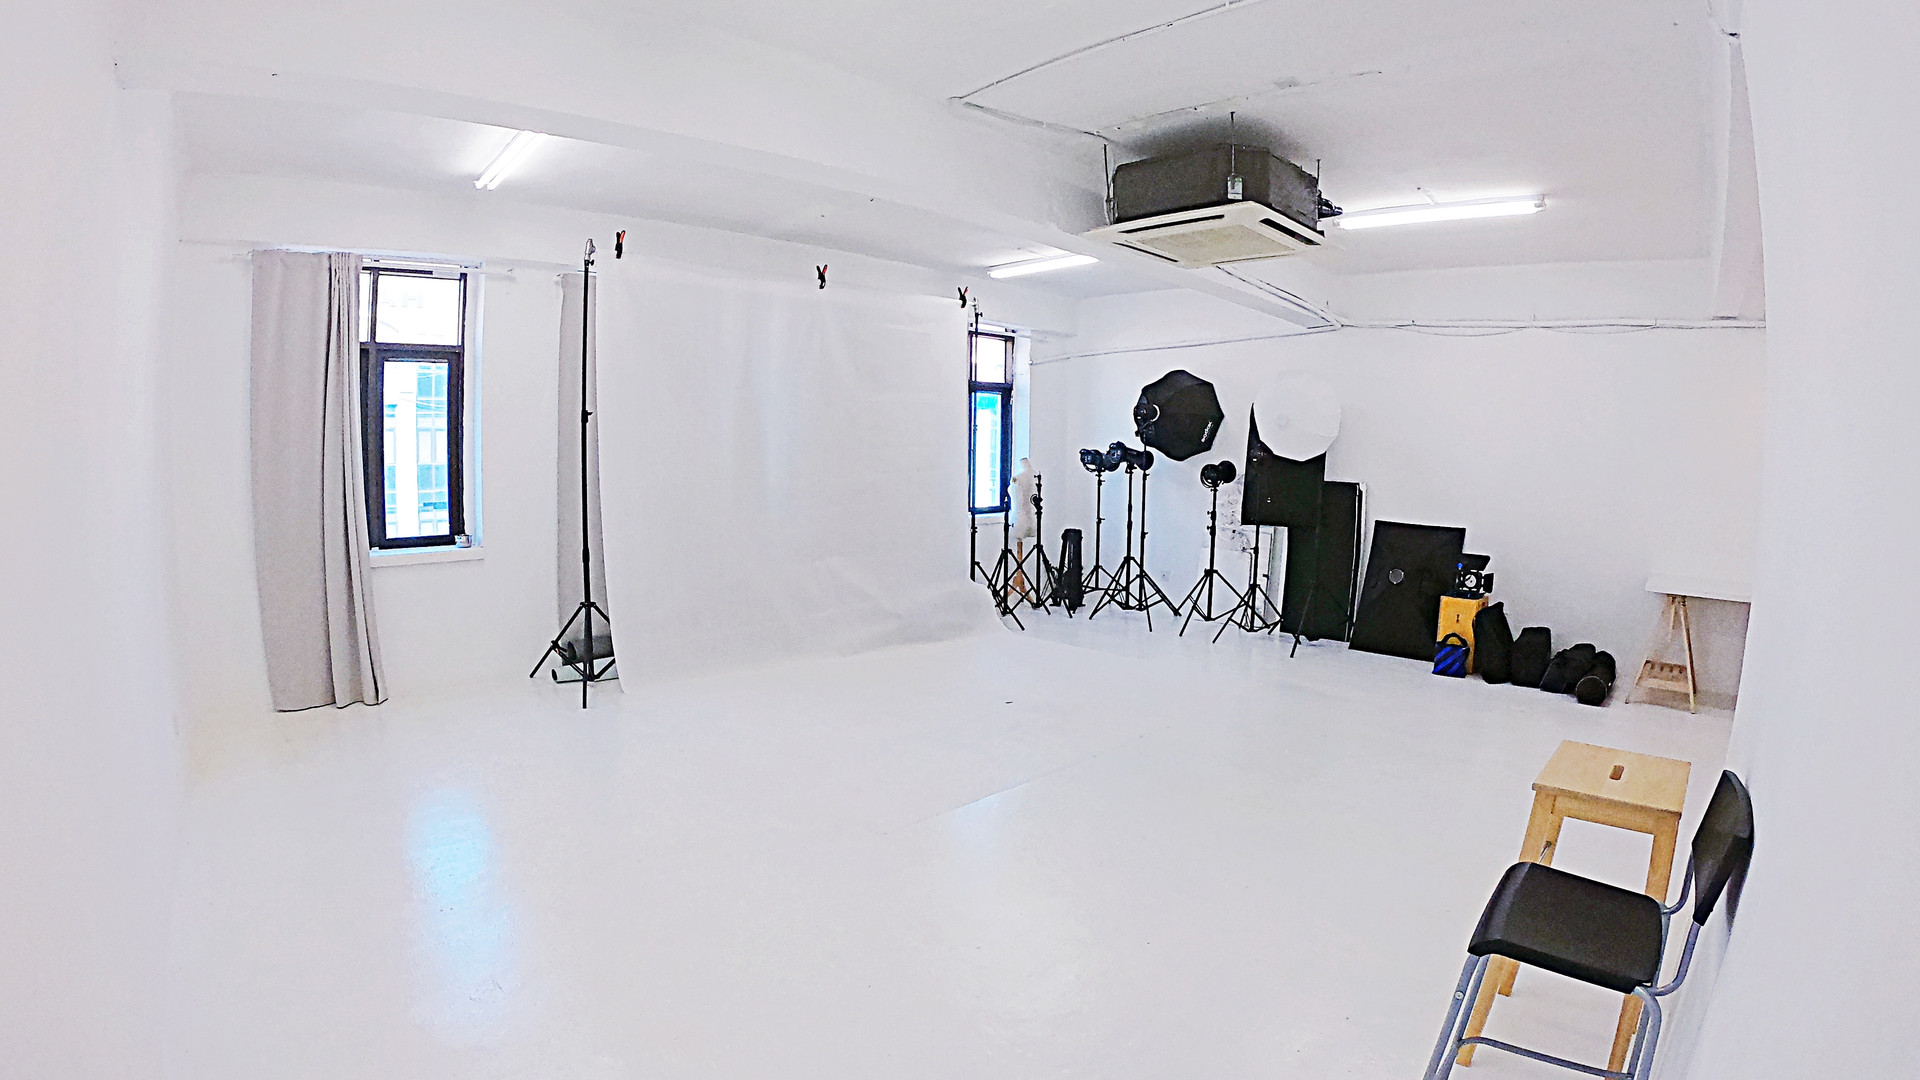 TheNextPictures_ShootingStudio_2R.jpg